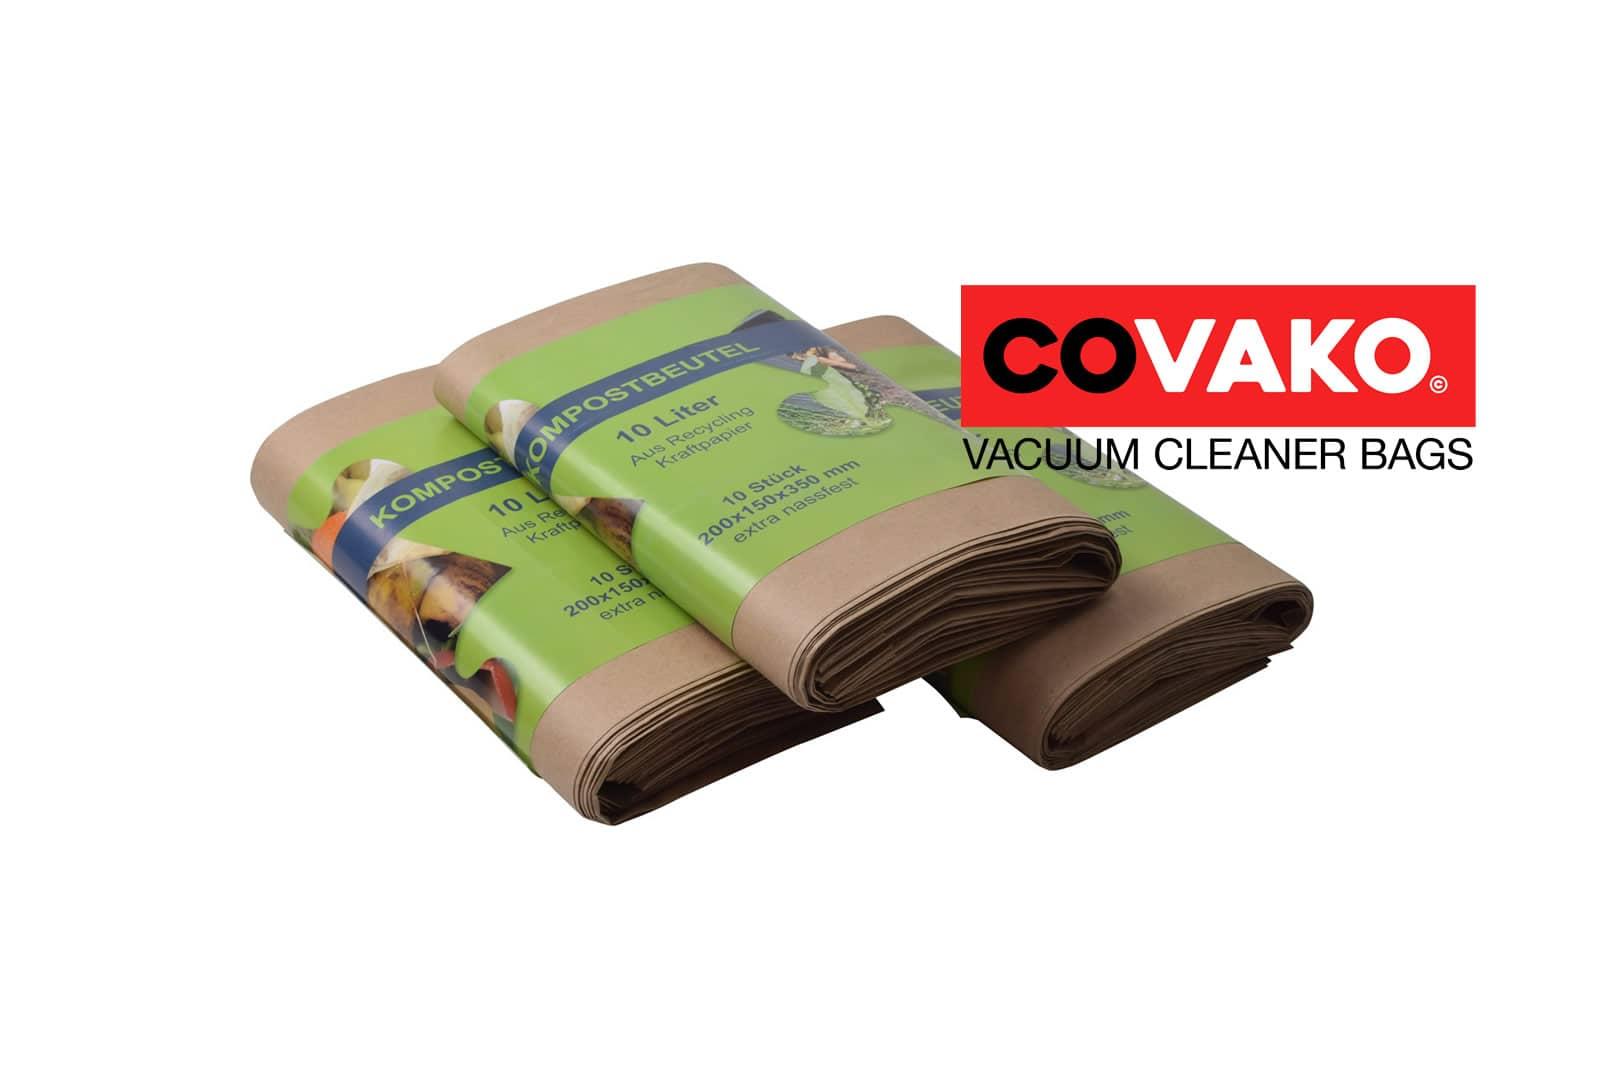 Biomüllbeutel kompostierbar / Partie - Biomüllbeutel kompostierbarsacs d'aspirateur